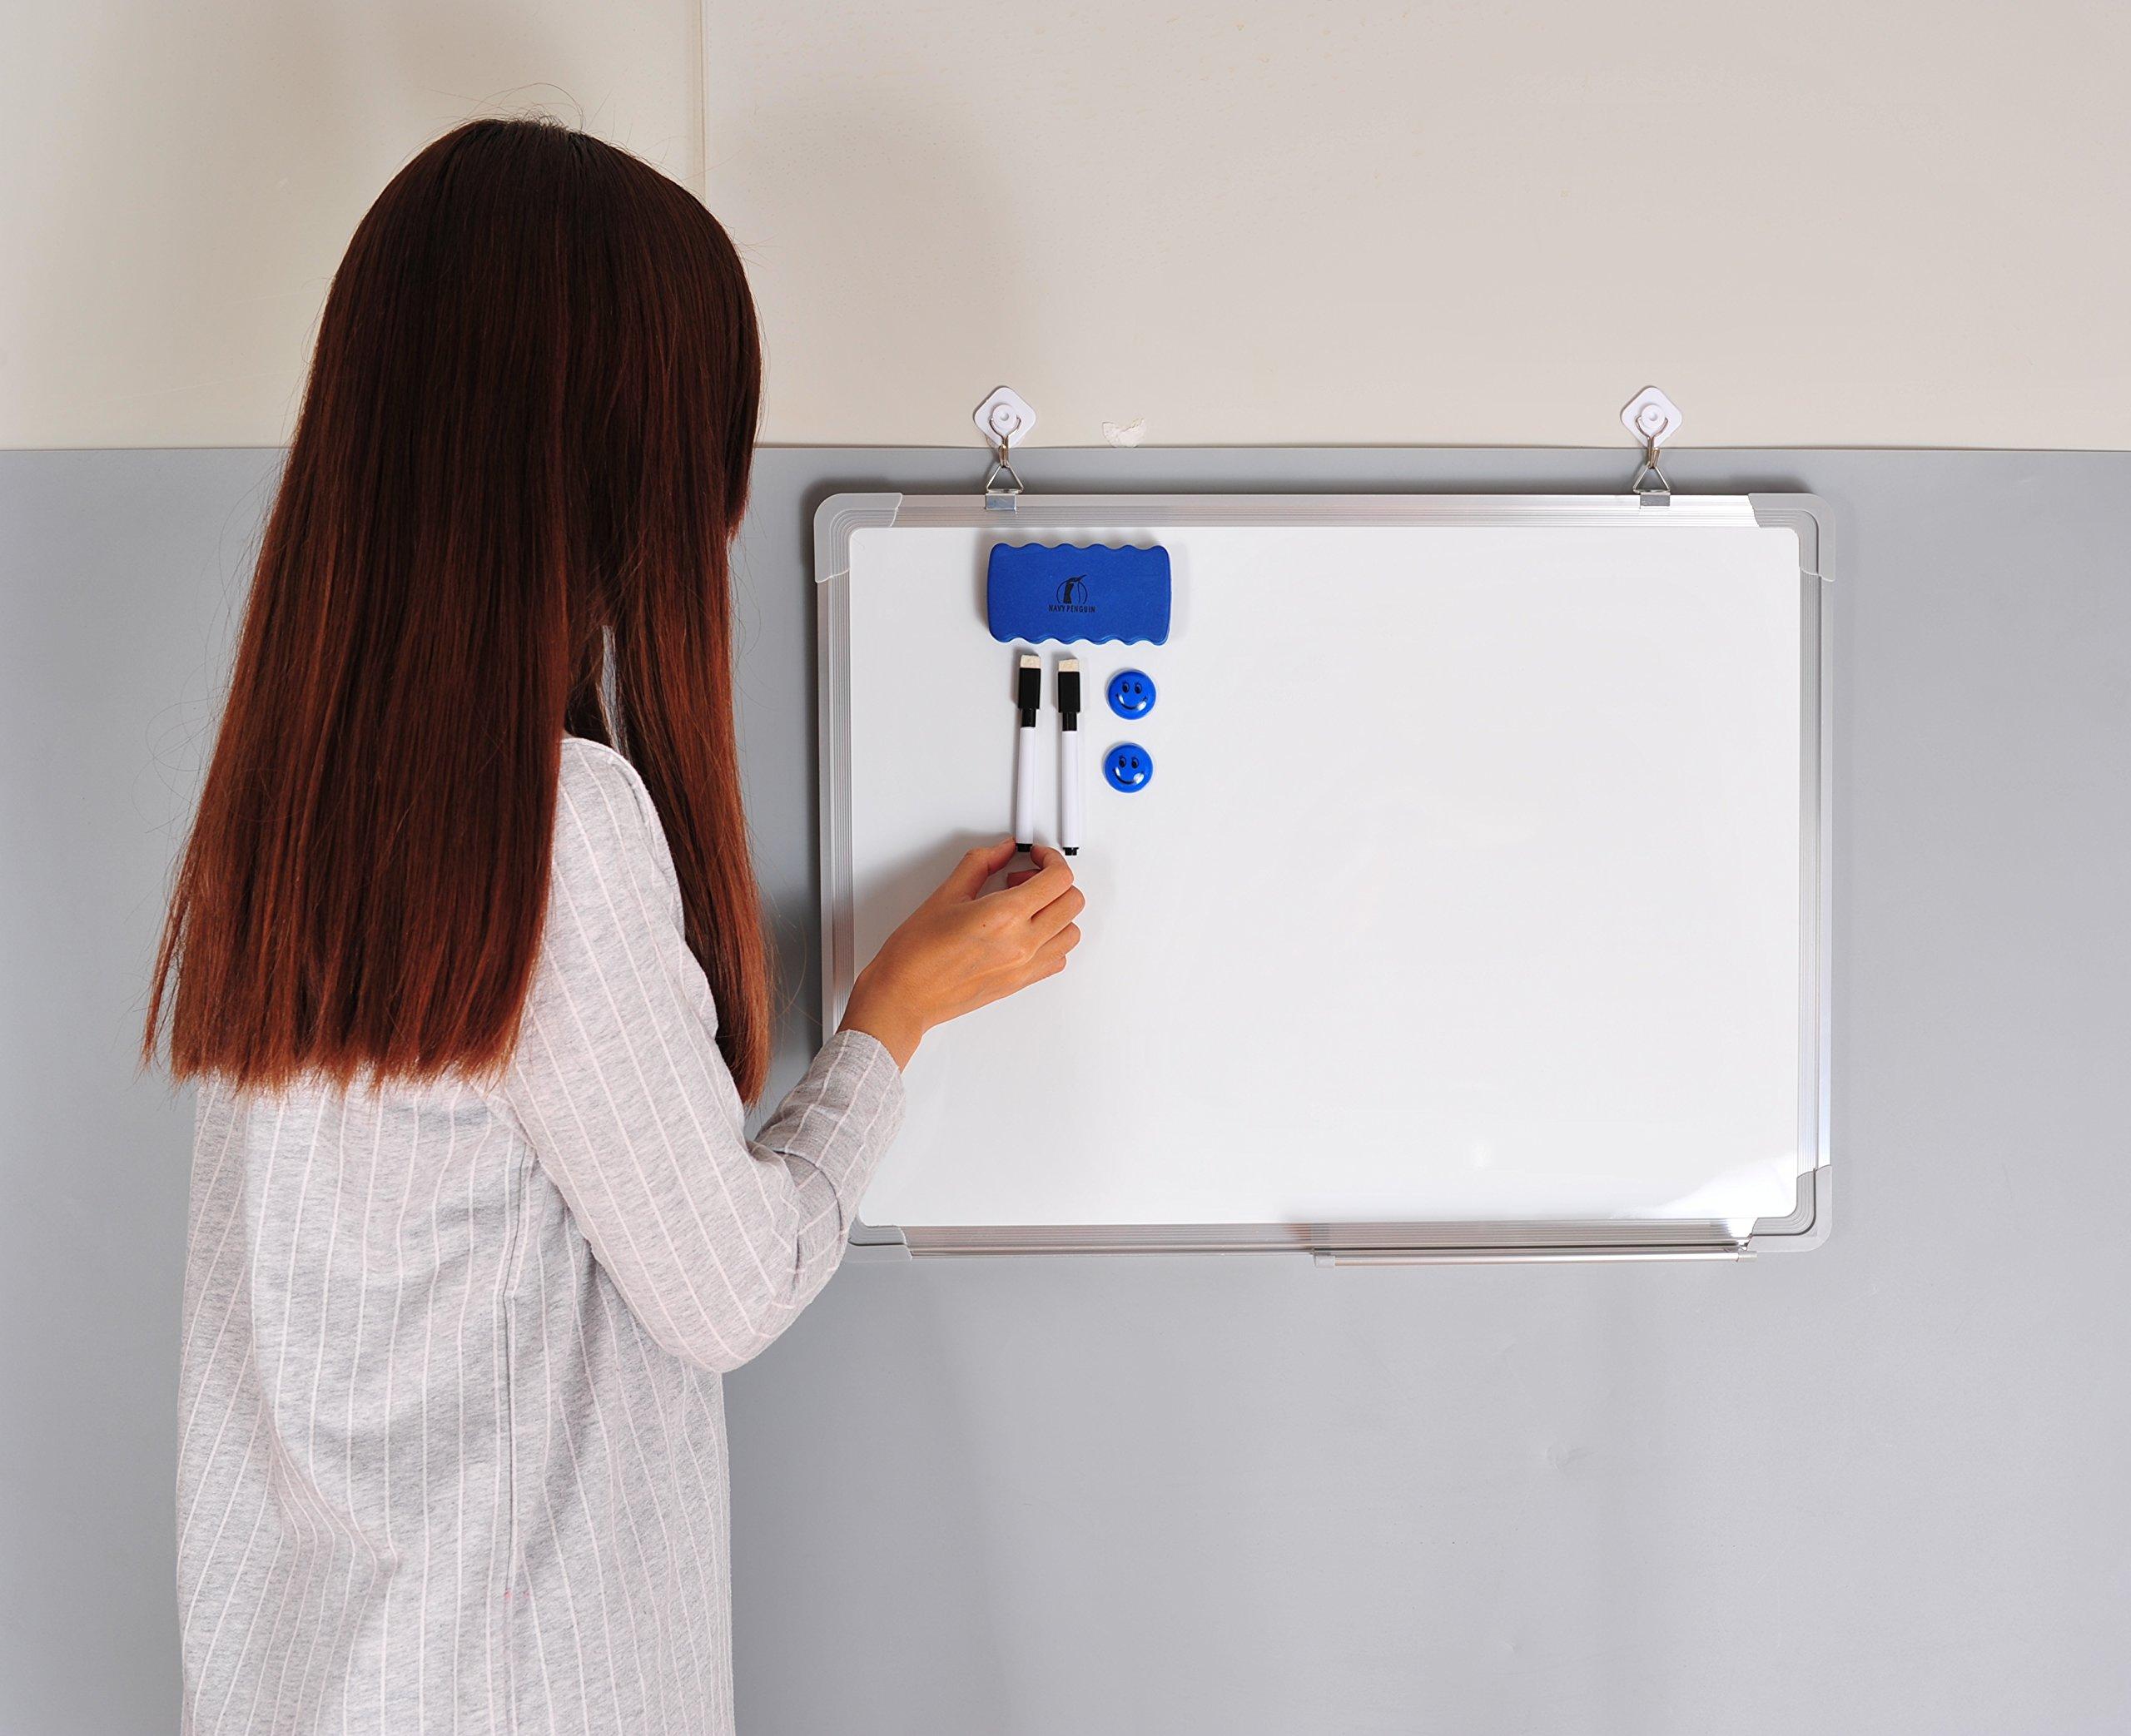 Whiteboard Set - Dry Erase Board 24 x 18 + 1 Magnetic Dry Eraser, 2 ...